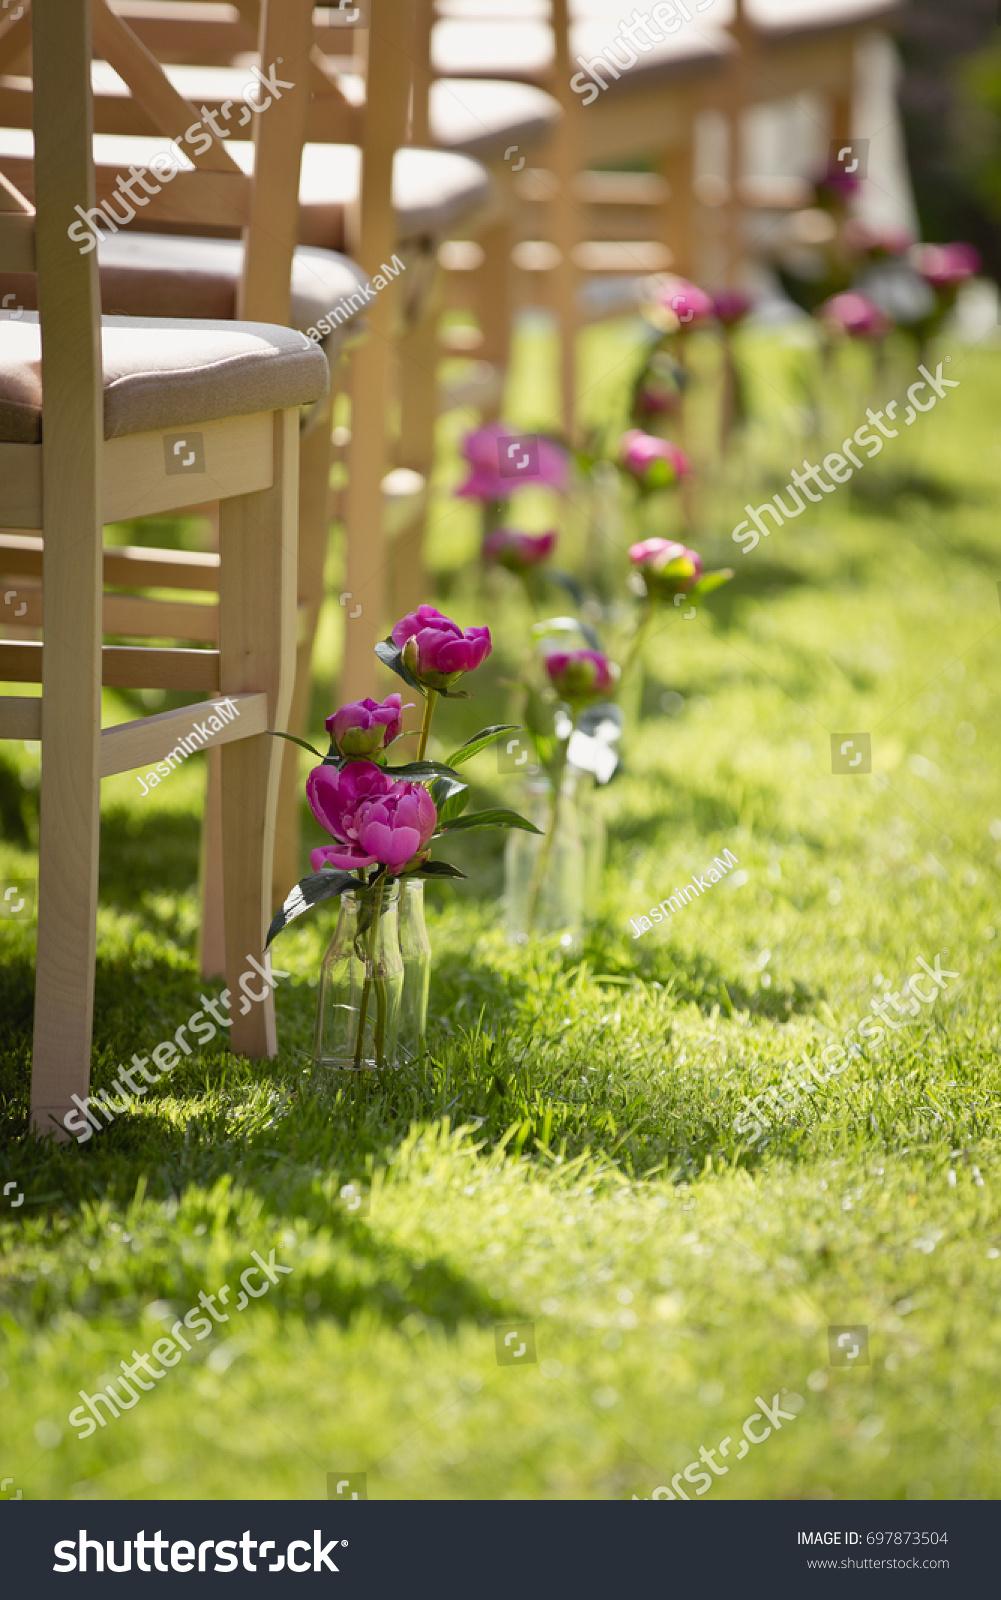 Wedding Set Garden Wedding Ceremony Wedding Stock Photo (Royalty ...